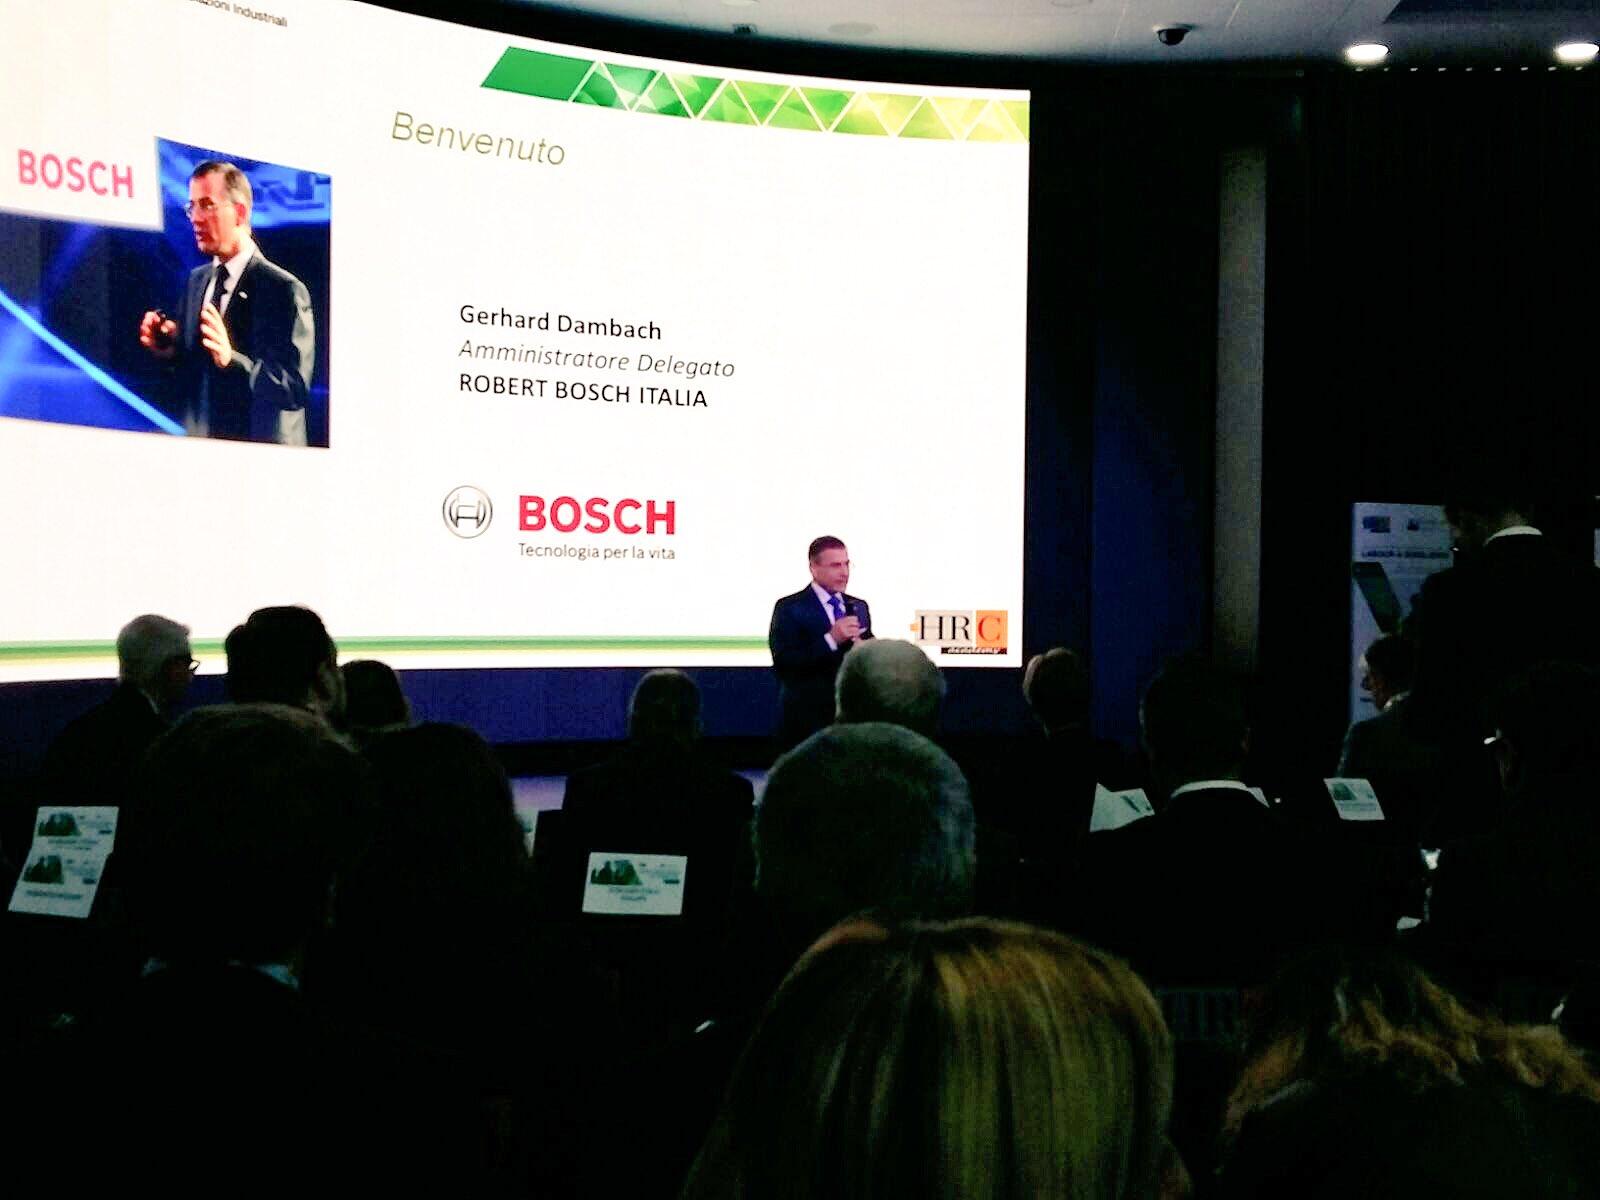 Dà il #benvenuto all' #HRCWelf2016 #Milano il CEO di #RobertBosch Italia @HRC_Academy #welfare https://t.co/ceD1RBjLl4